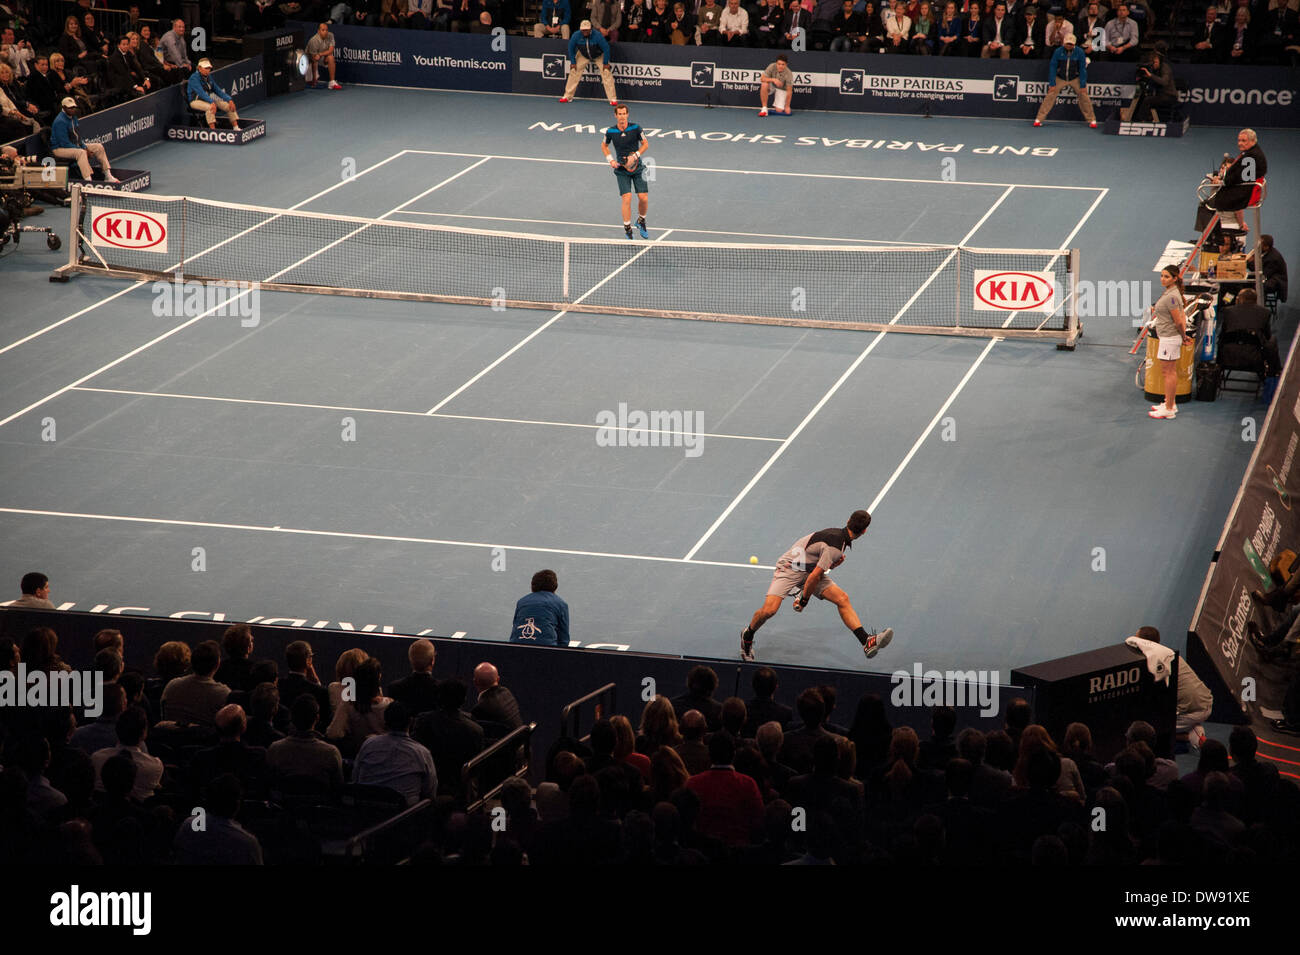 Manhattan, New York, USA. 3rd Mar, 2014. March 03, 2014: Novak Djokovic returns the ball through his legs to Andy Murray during The BNP Paribas Showdown on World Tennis Day at Madison Square Garden in Manhattan, New York. Credit:  csm/Alamy Live News - Stock Image